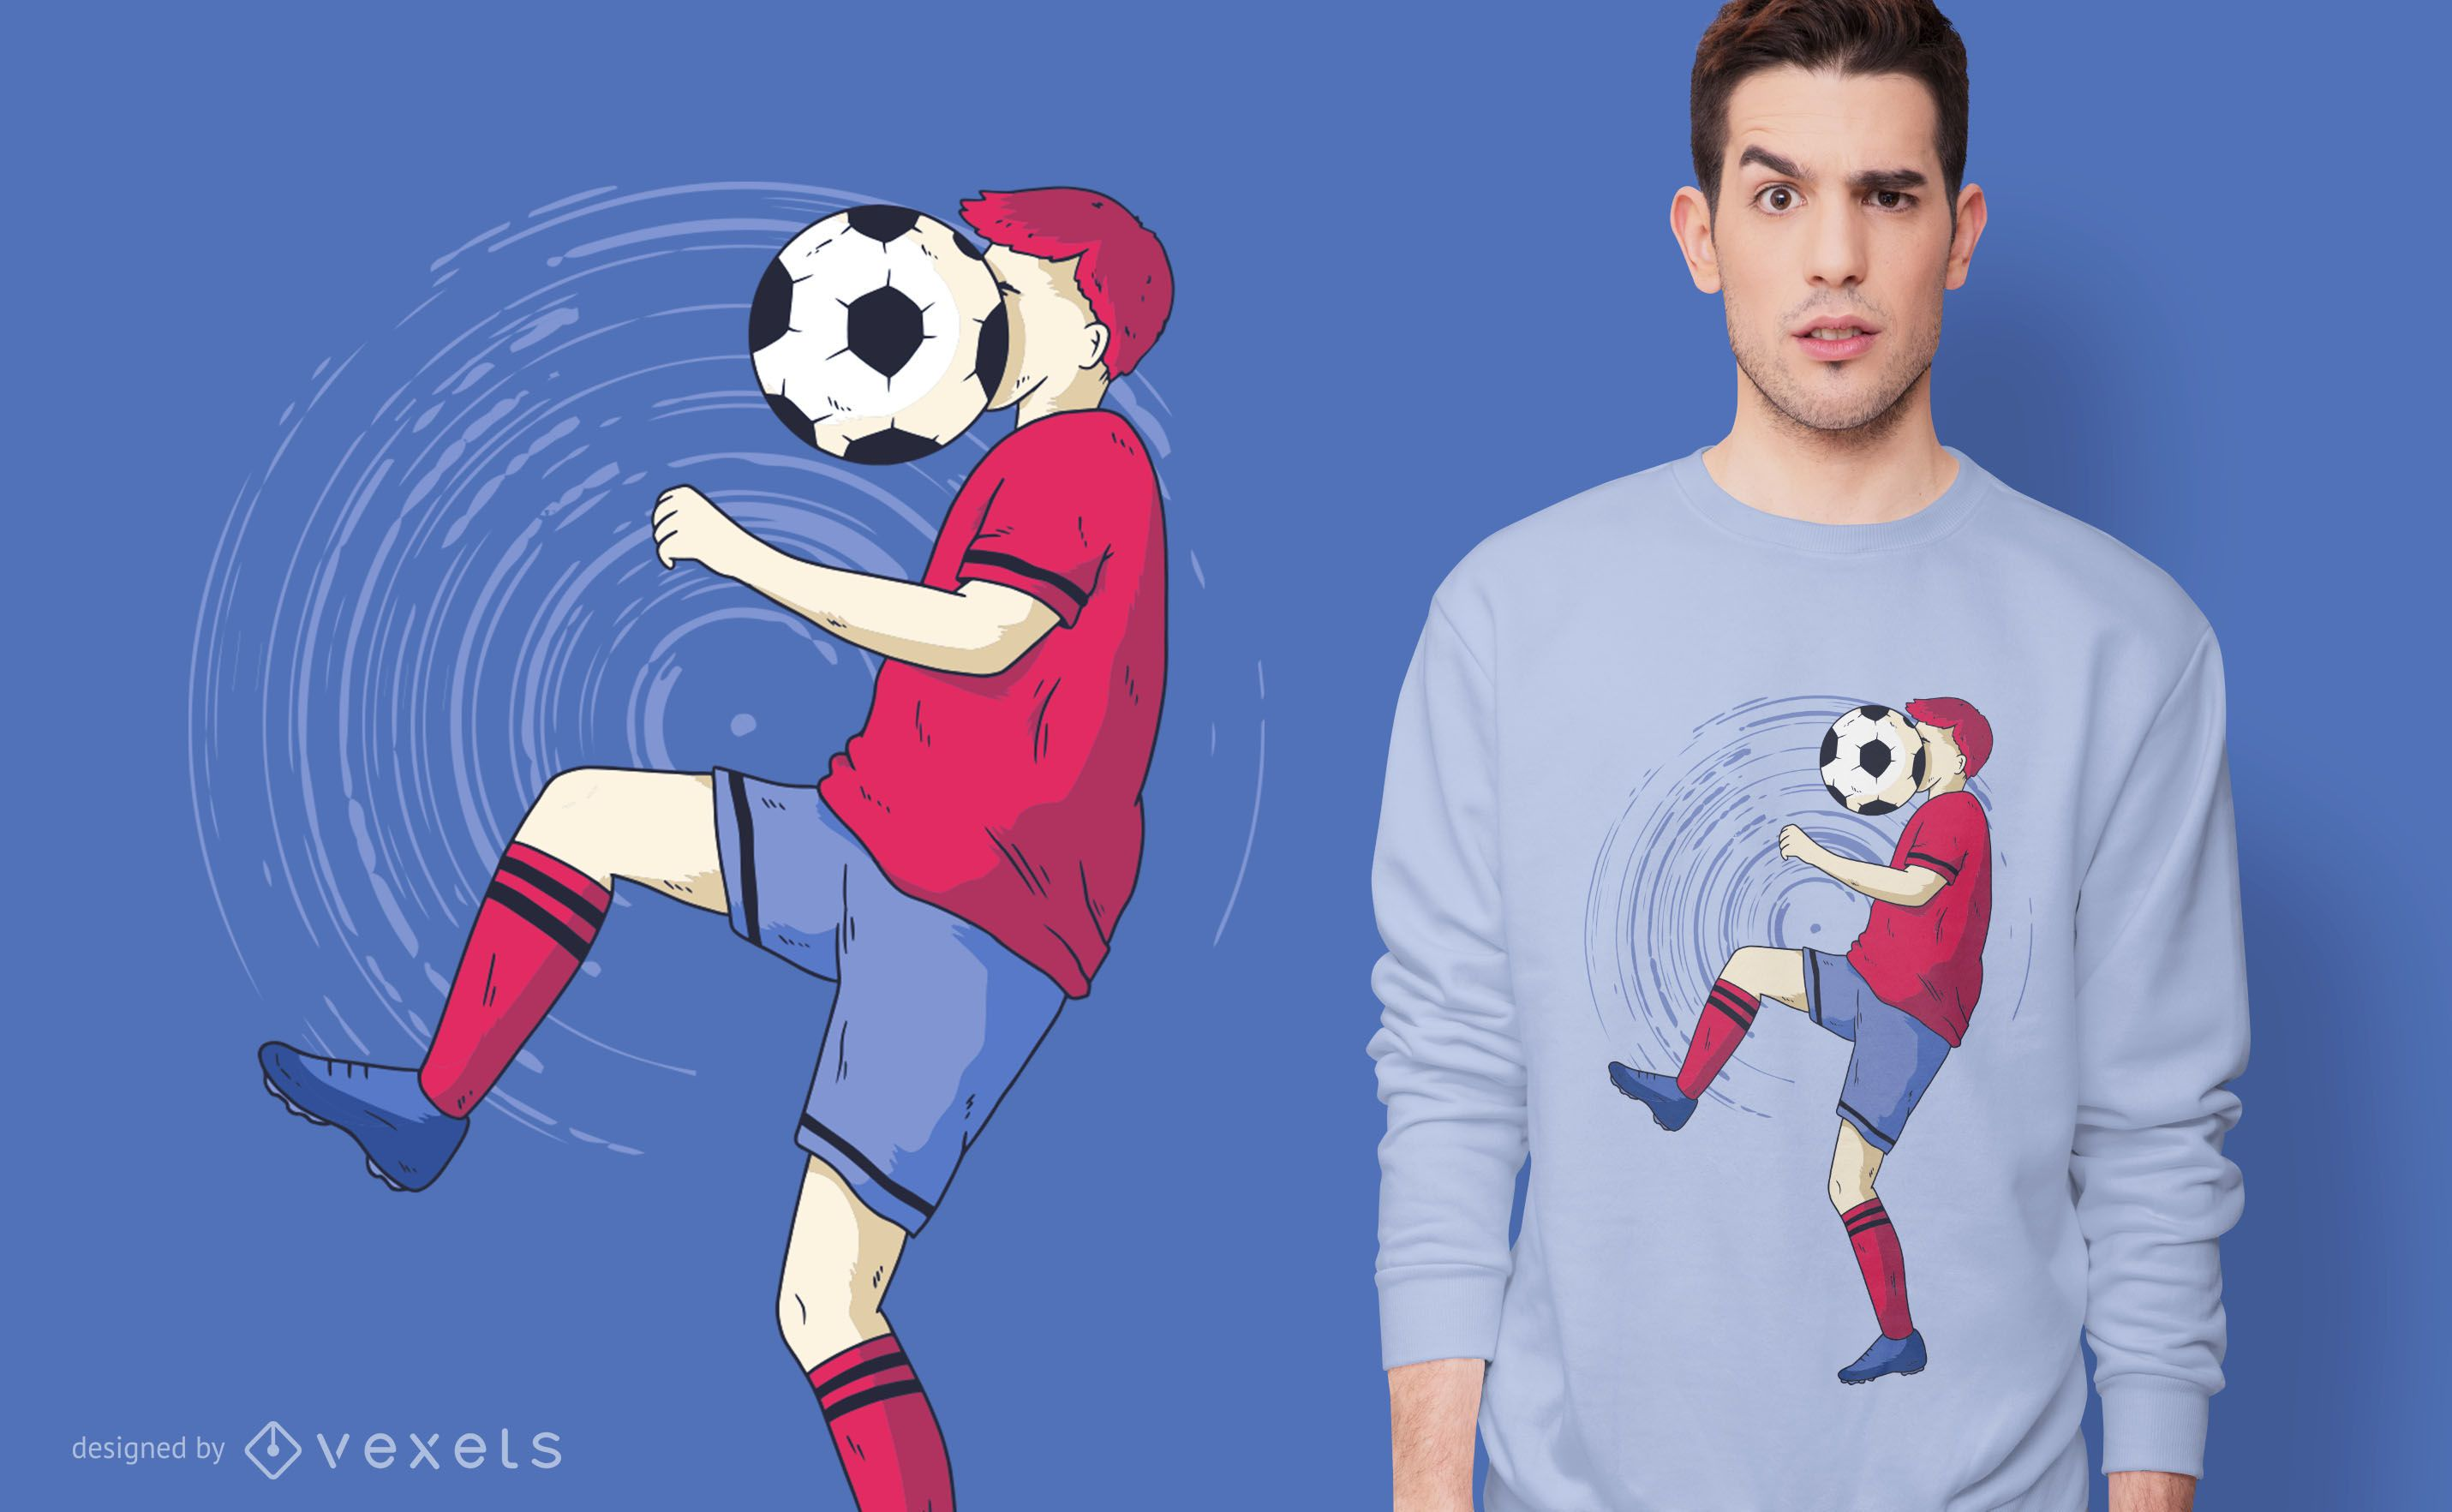 Funny soccer t-shirt design